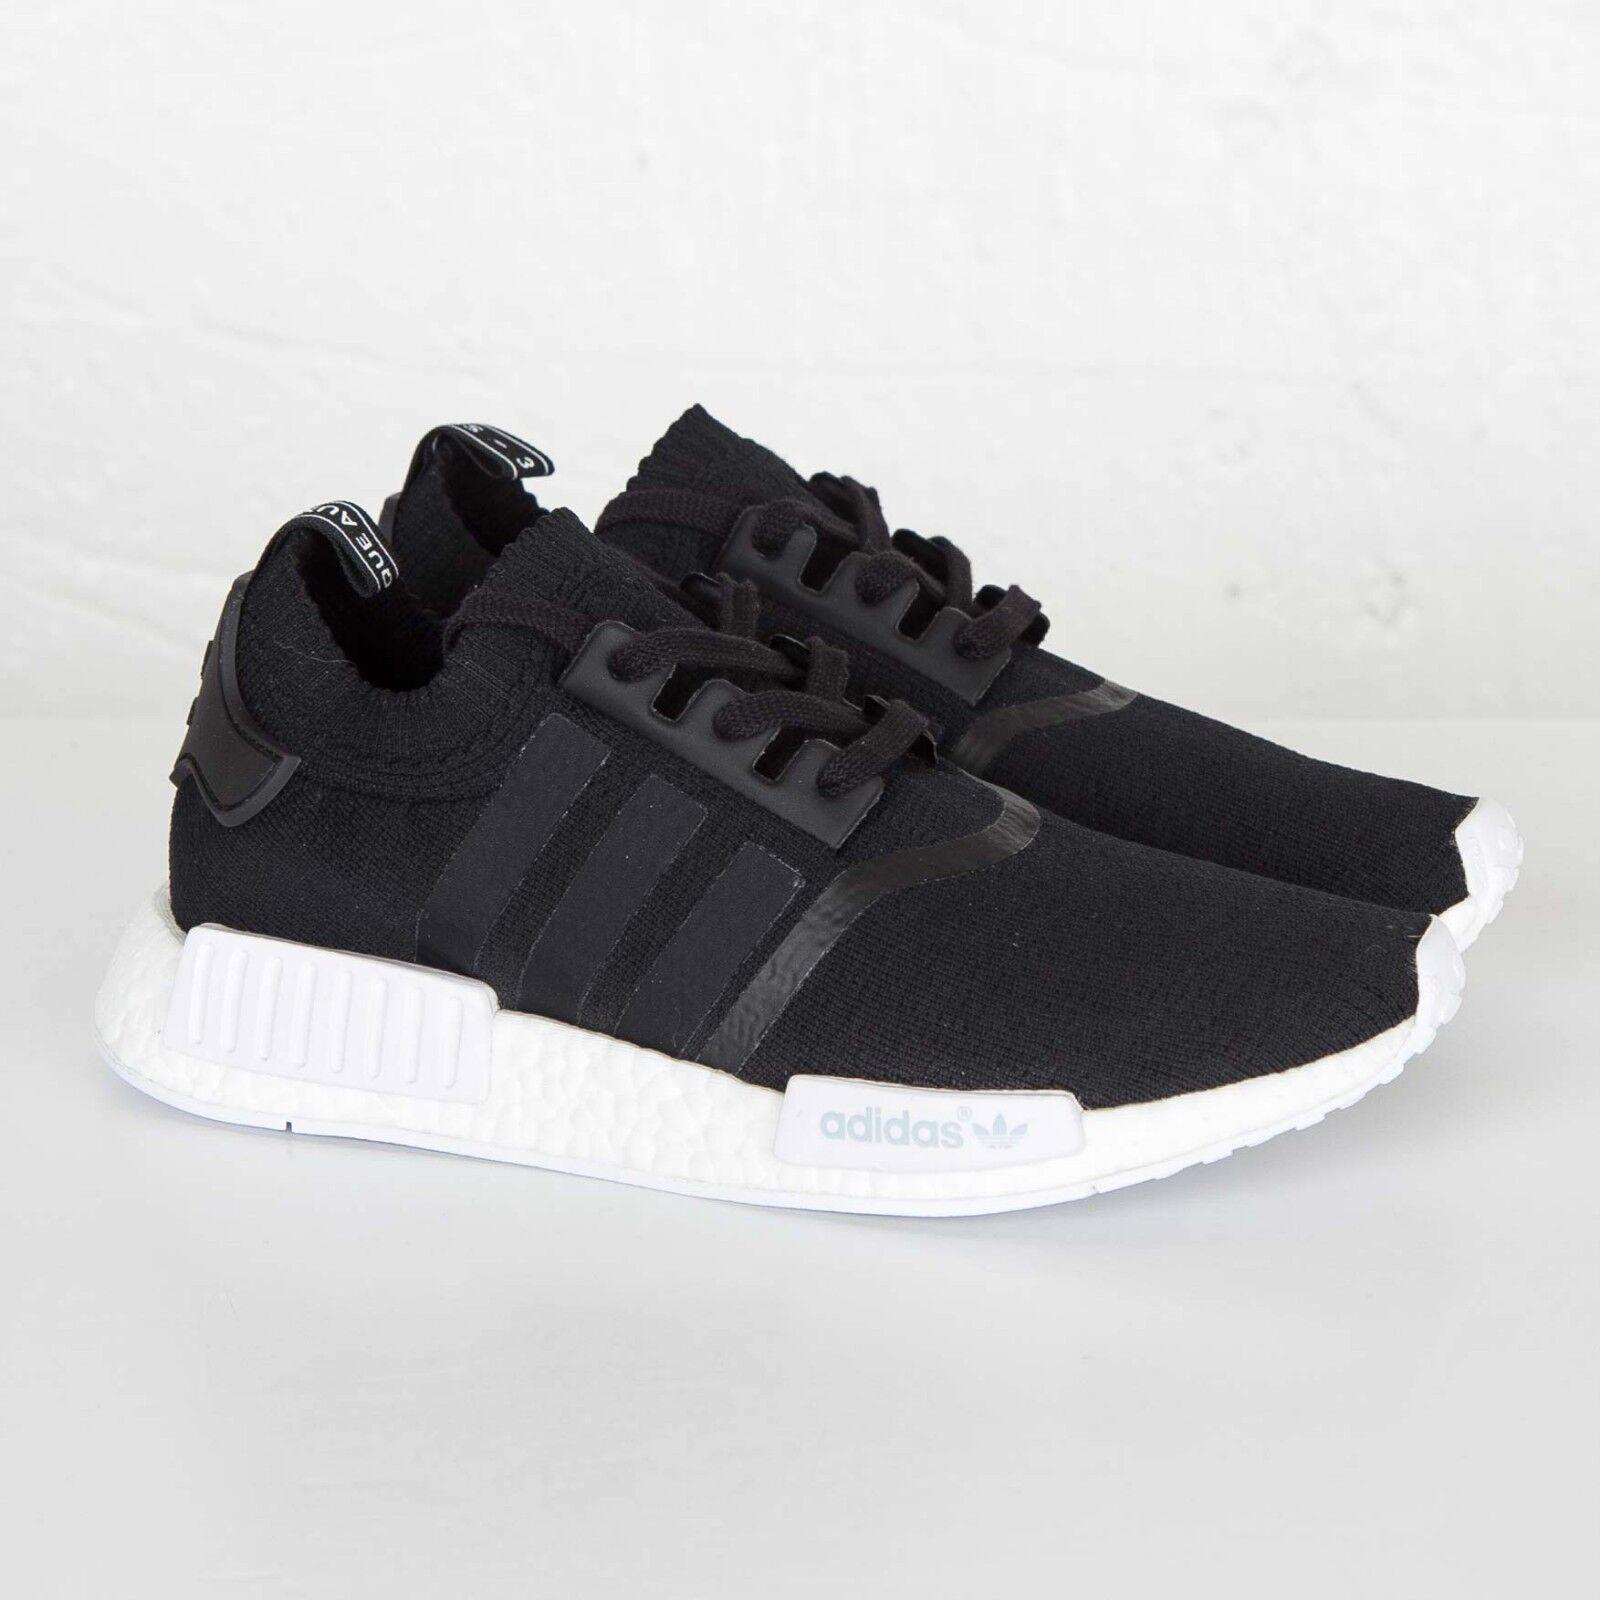 Adidas NMD R1 PK White Black White PK OG Monochrome Size 14. BA8629 yeezy ultra boost 23875e